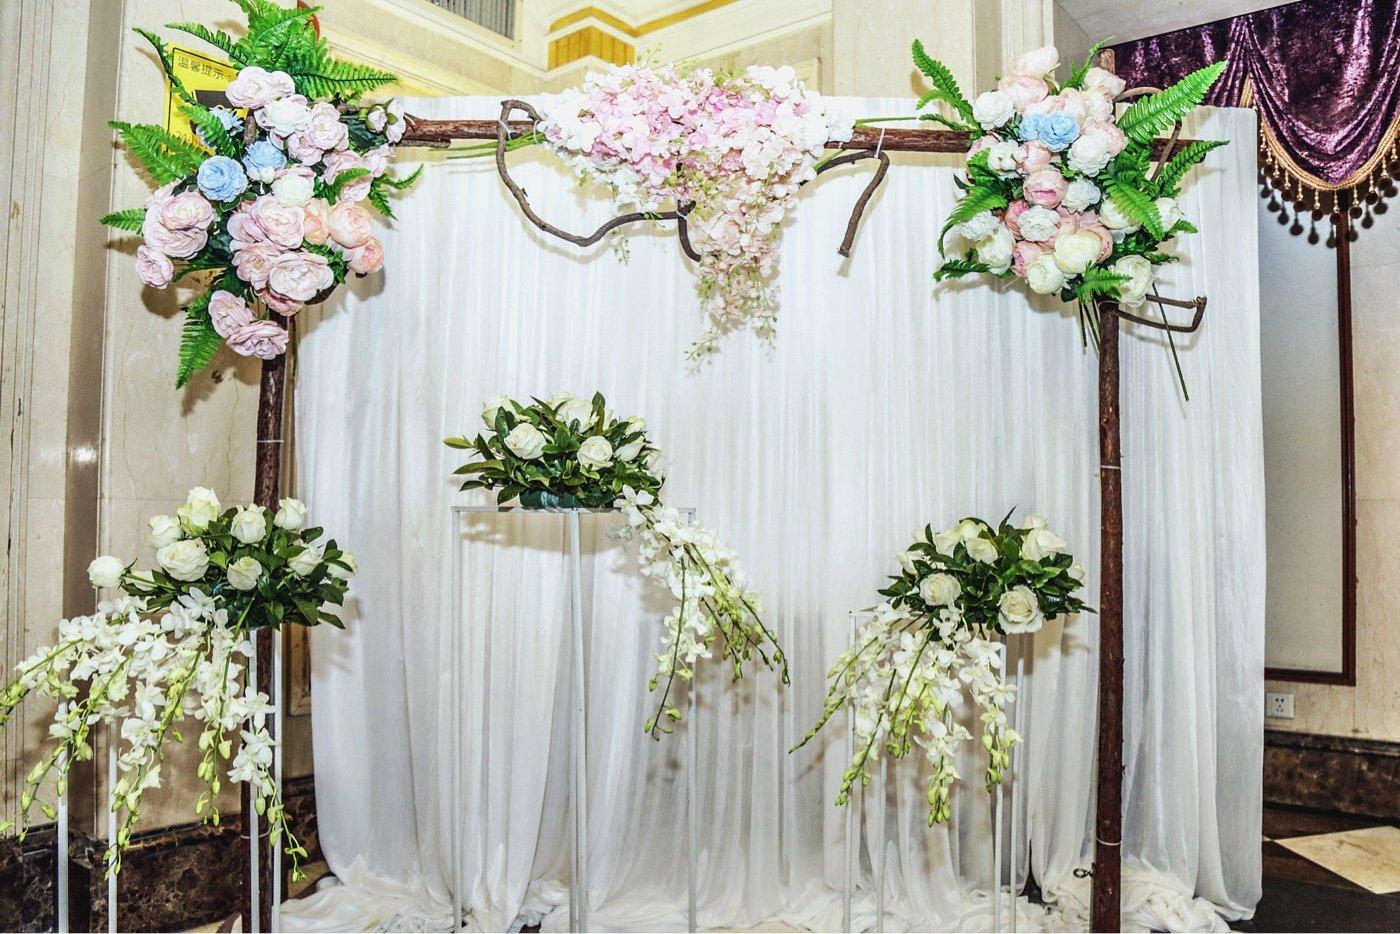 「Fantasy Wedding」&明珠教堂⛪17